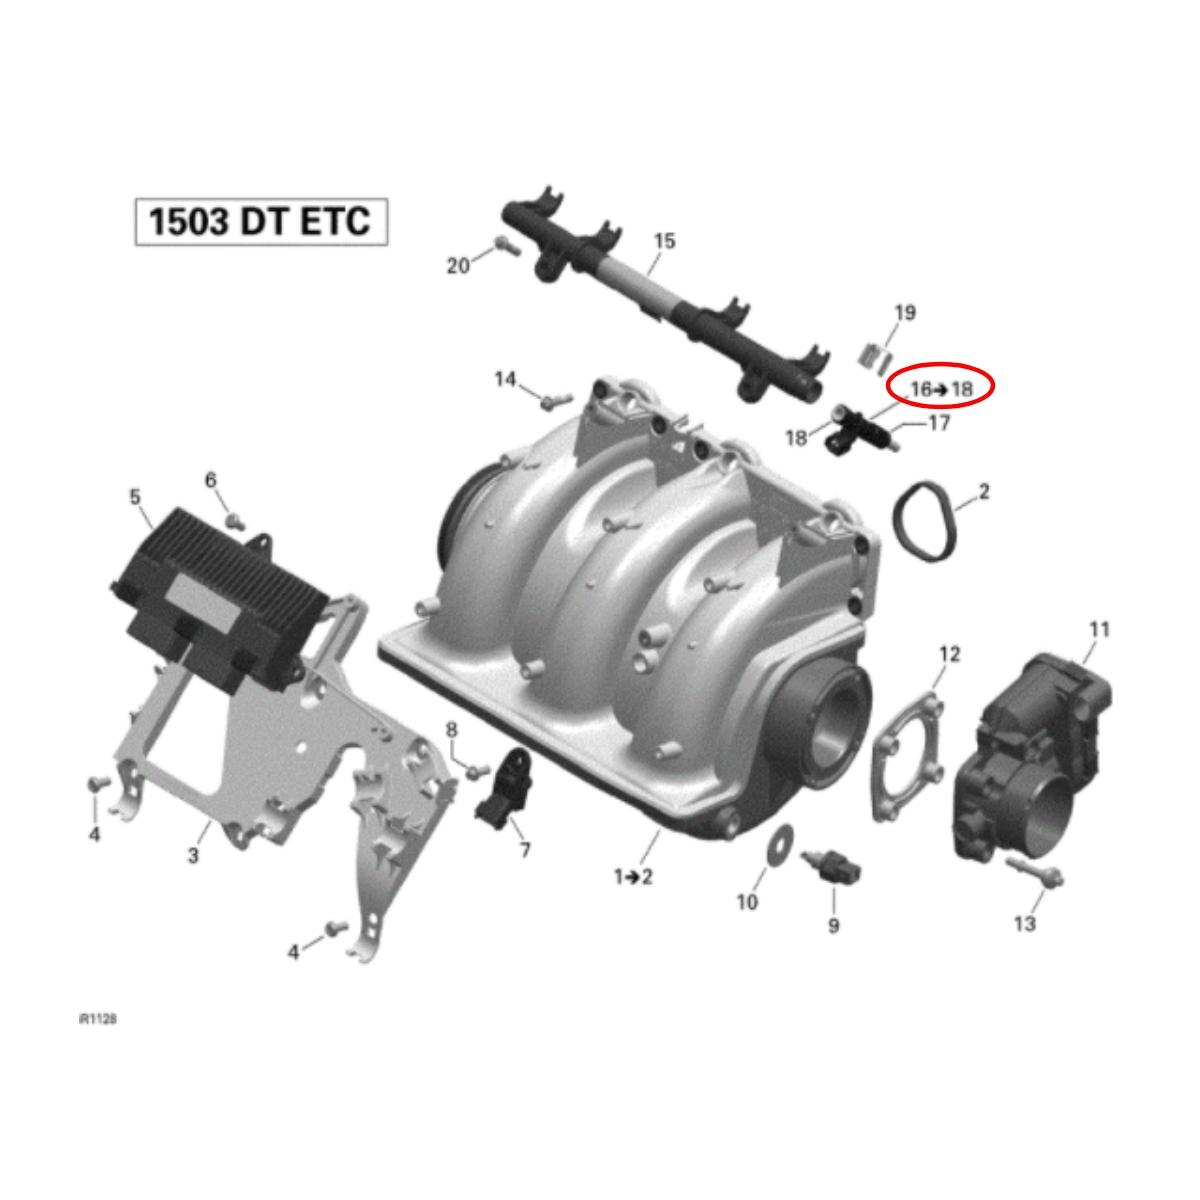 Bico Injetor para Jet Ski Sea Doo GTX 155/RXT 260 (2009 à 2016)  - Radical Peças - Peças para Jet Ski